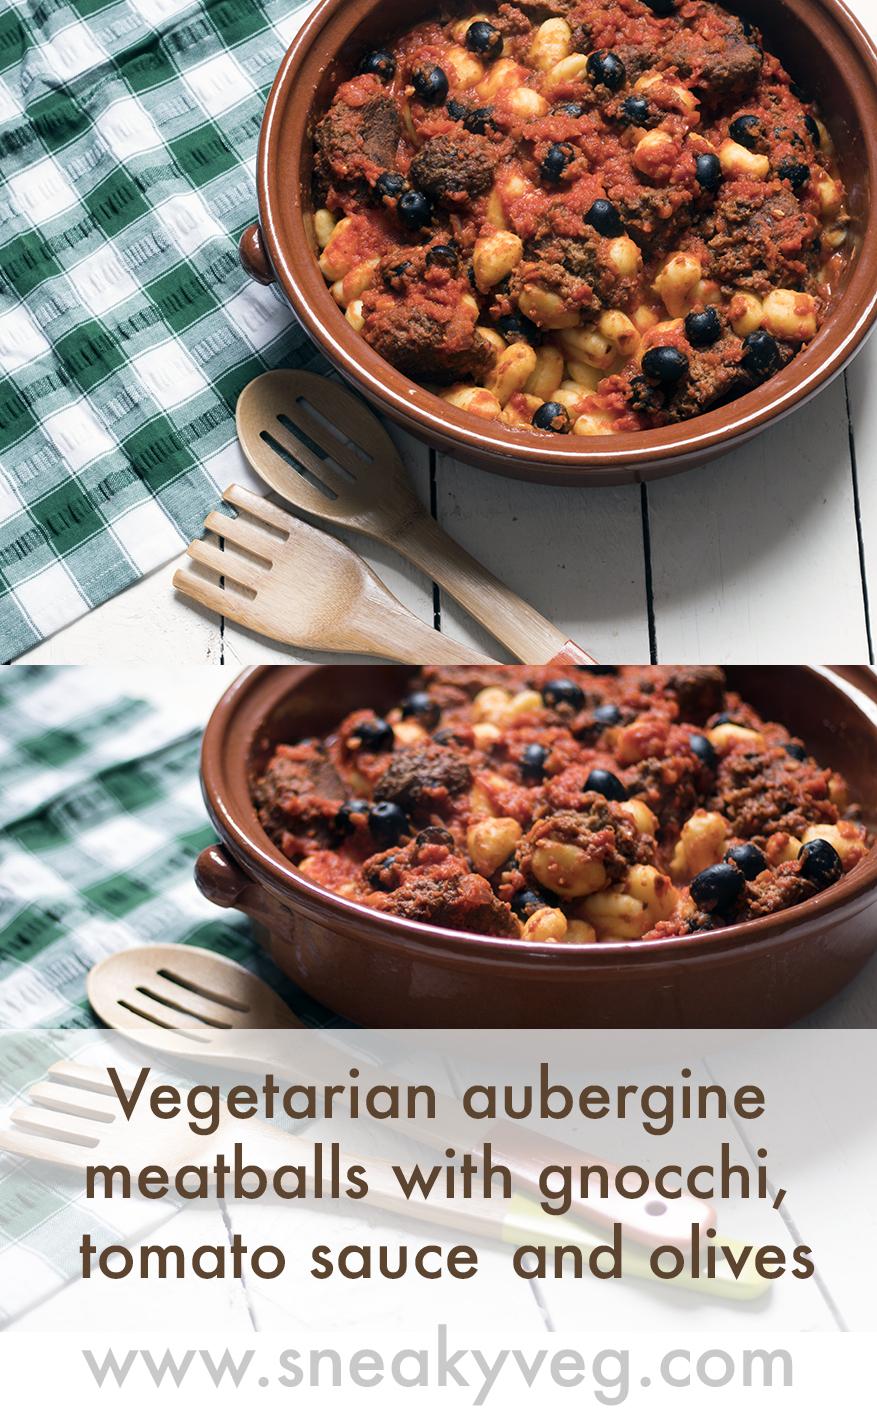 vegetarian-aubergine-meatballs-gnocchi-tomato-sauce